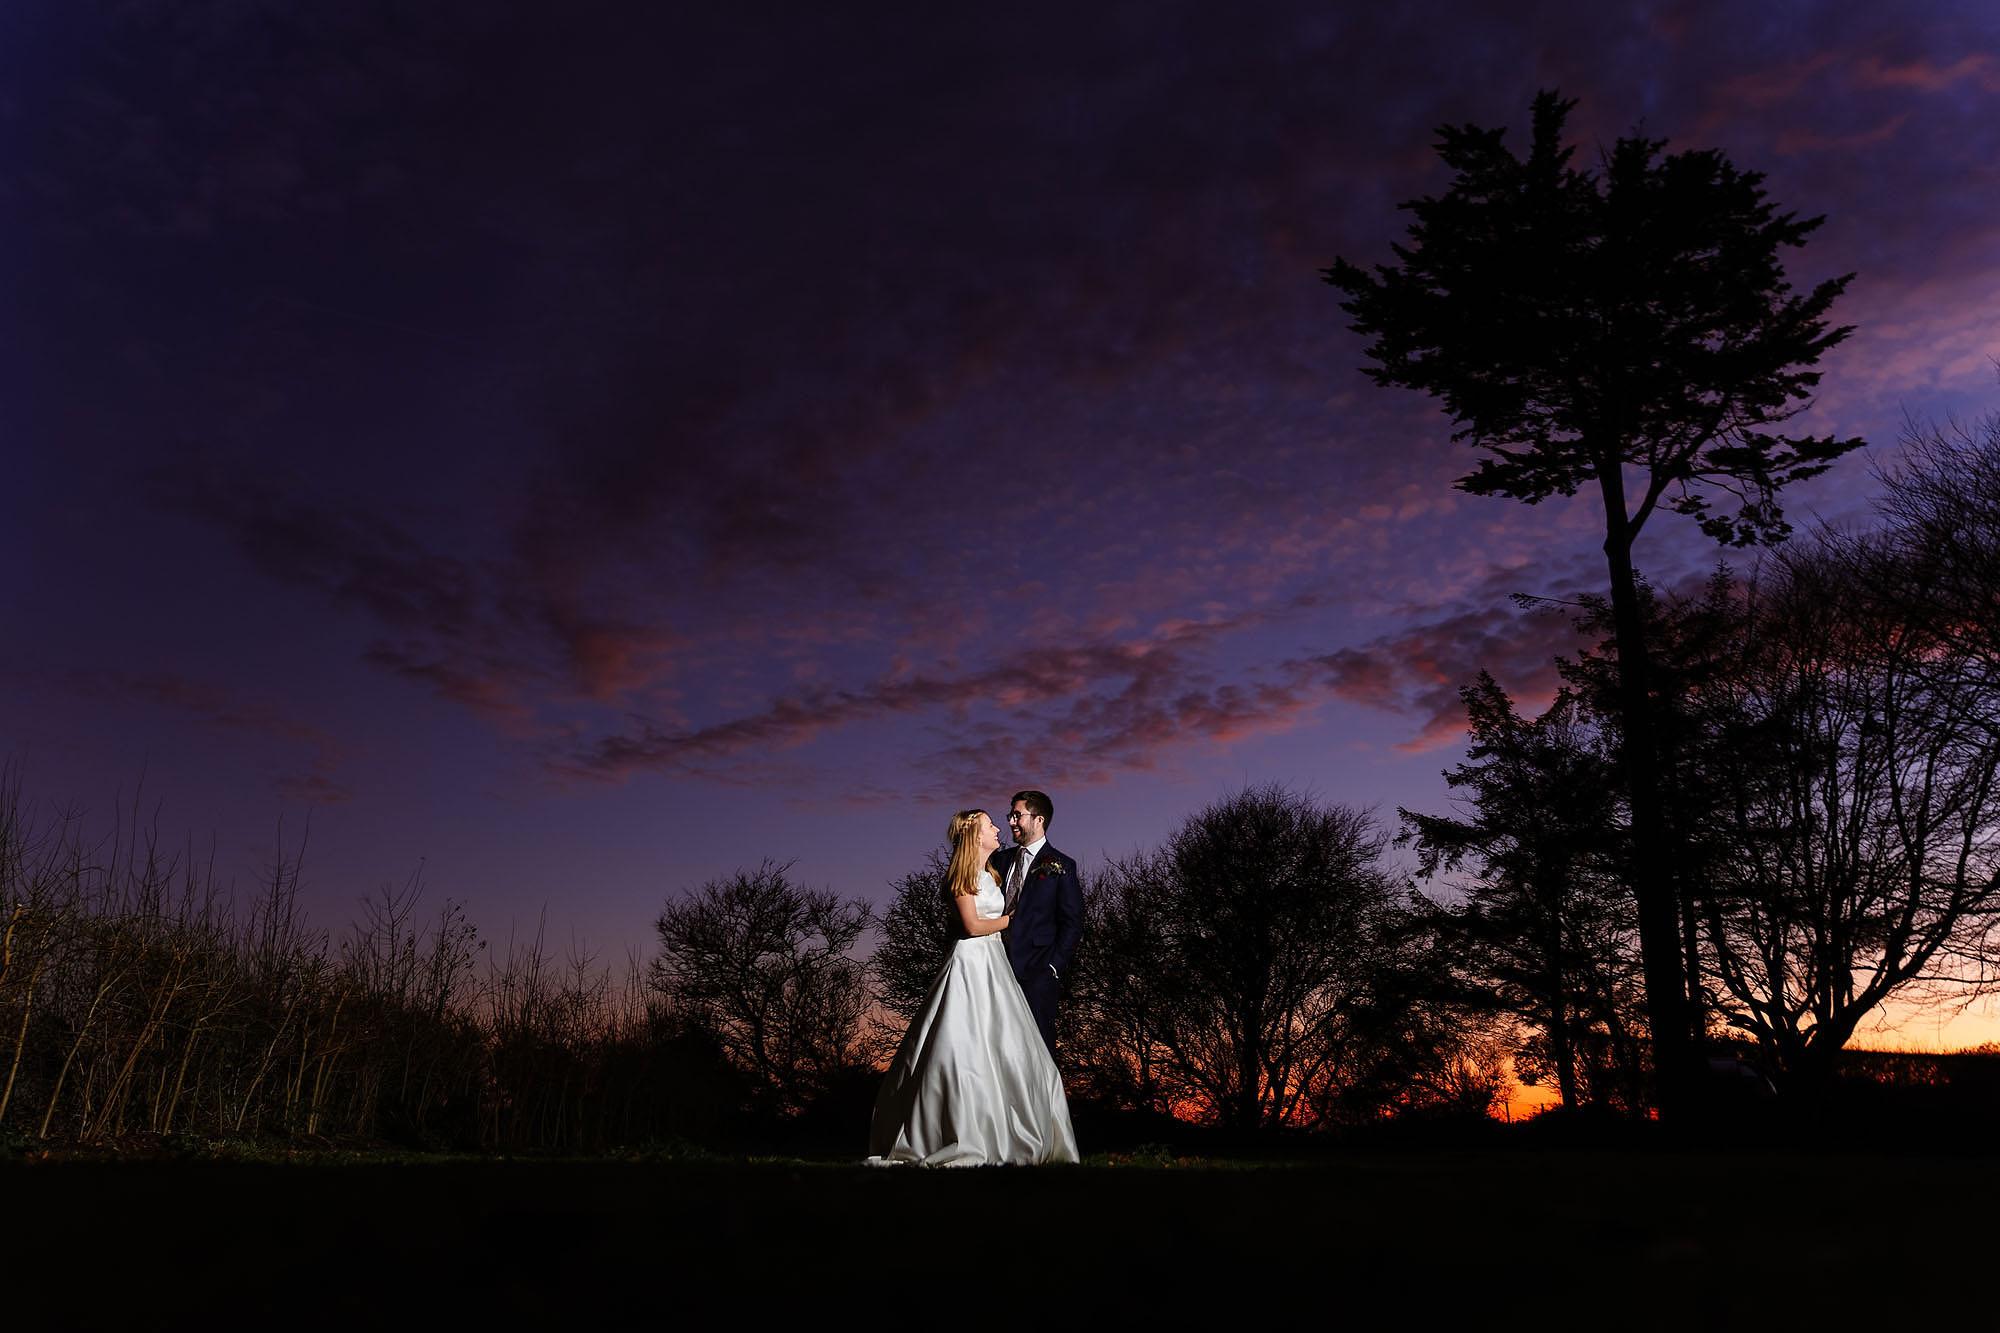 Blythburgh winter wedding photos